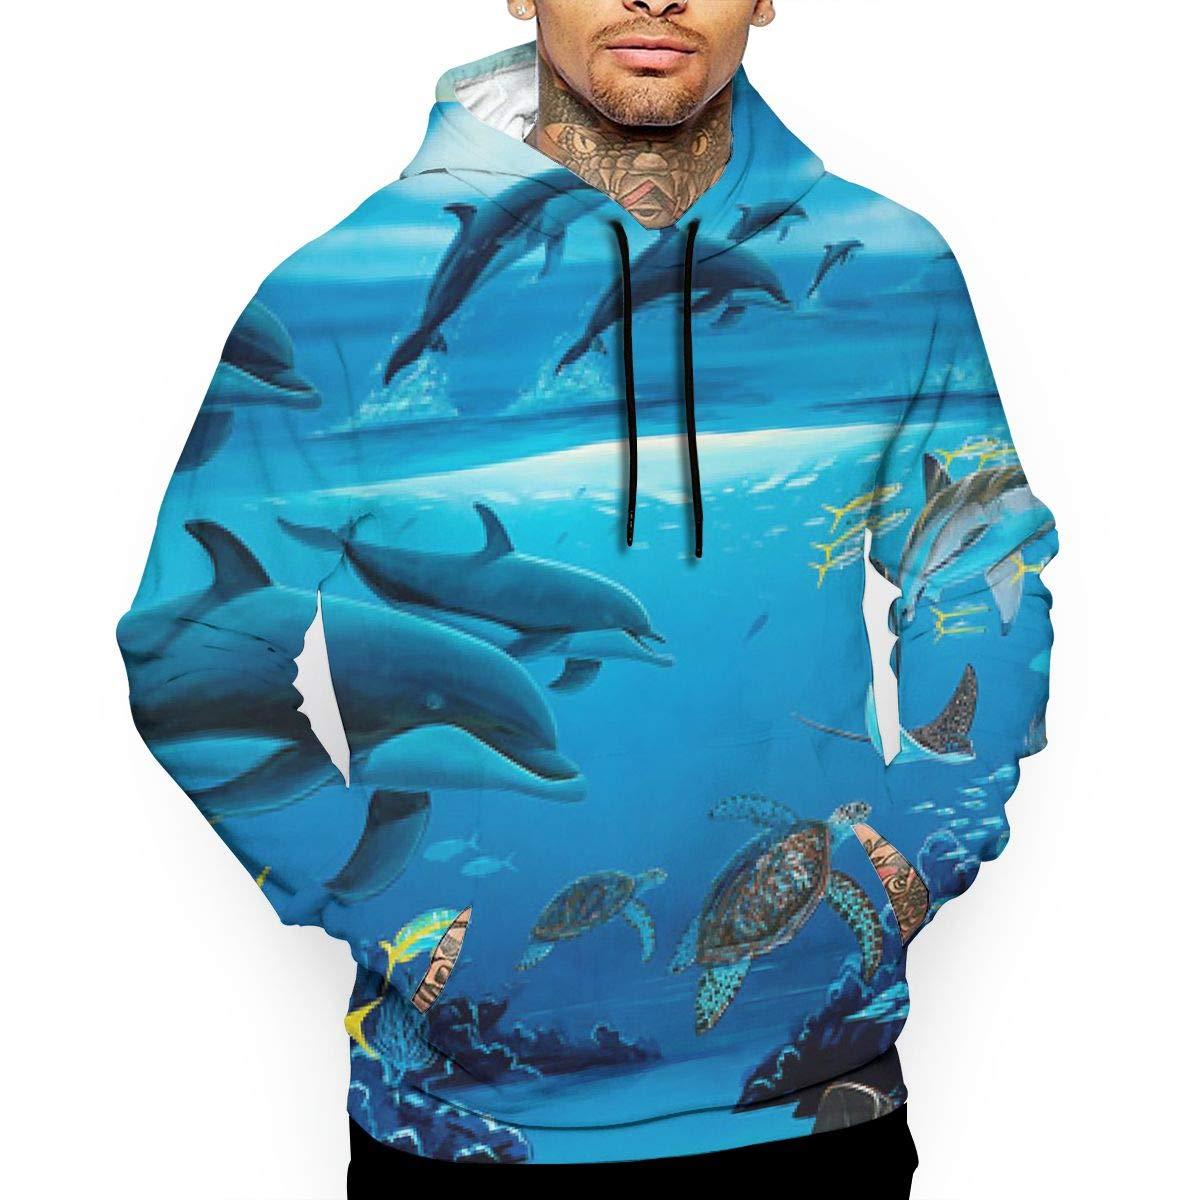 Dolphin and Sea Animals Mans Long Sleeve Hoodie Casual Pocket Hooded Sweatshirt